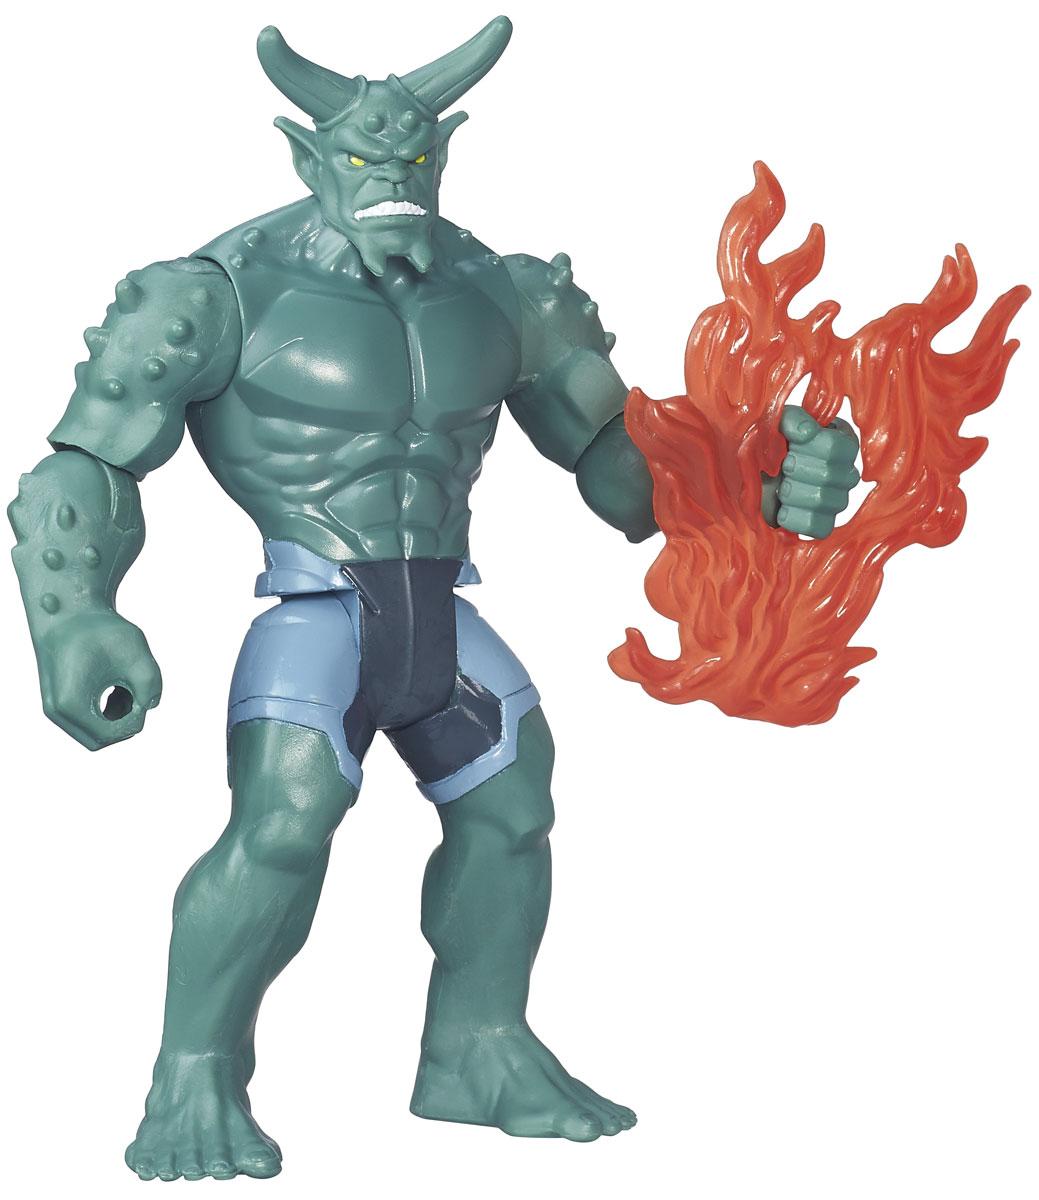 Spider-Man Фигурка Green Goblin B5875